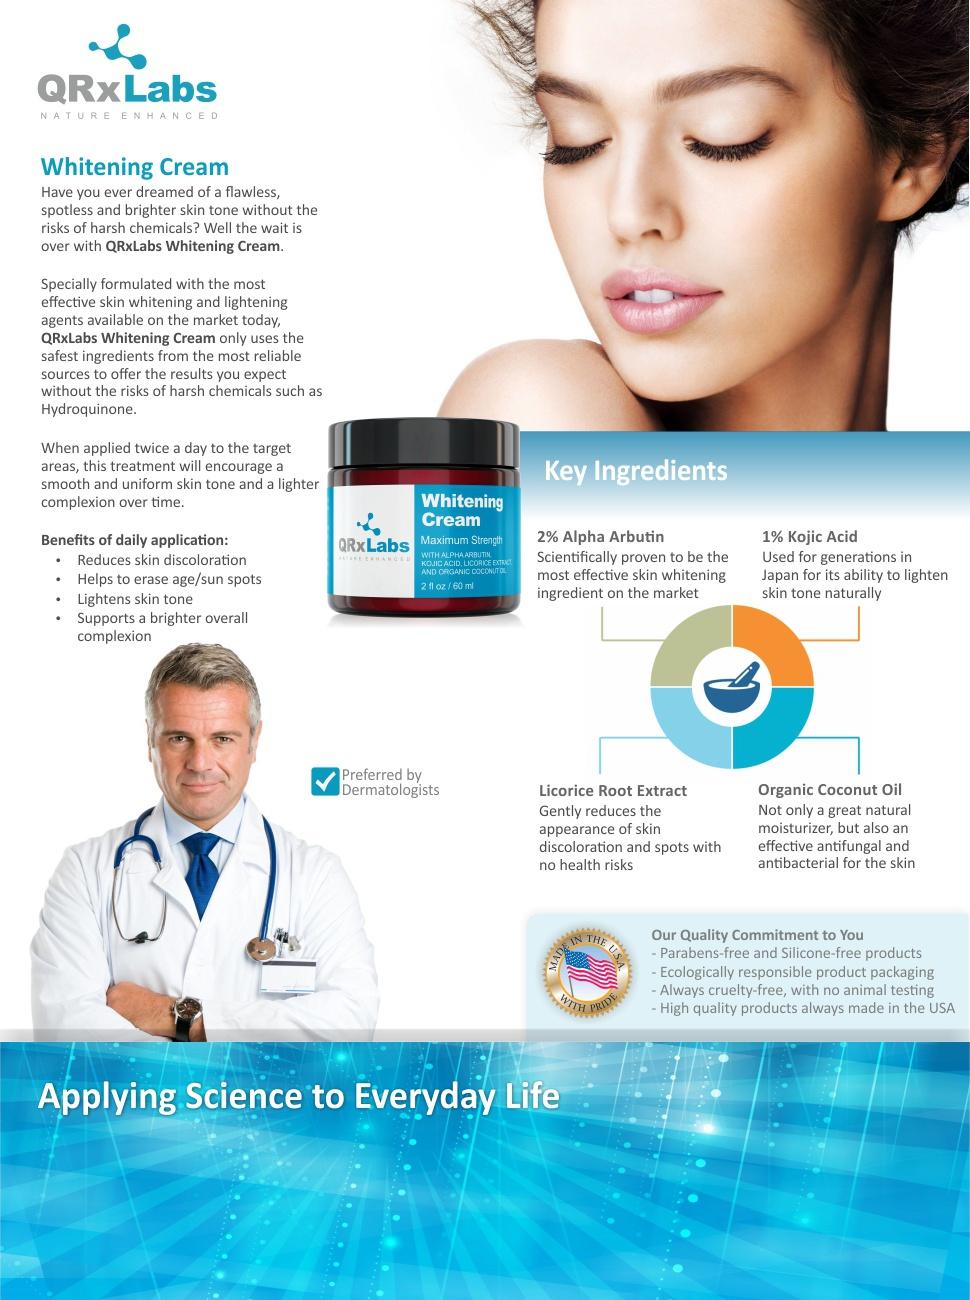 QRxLabs Whitening Cream Brochure